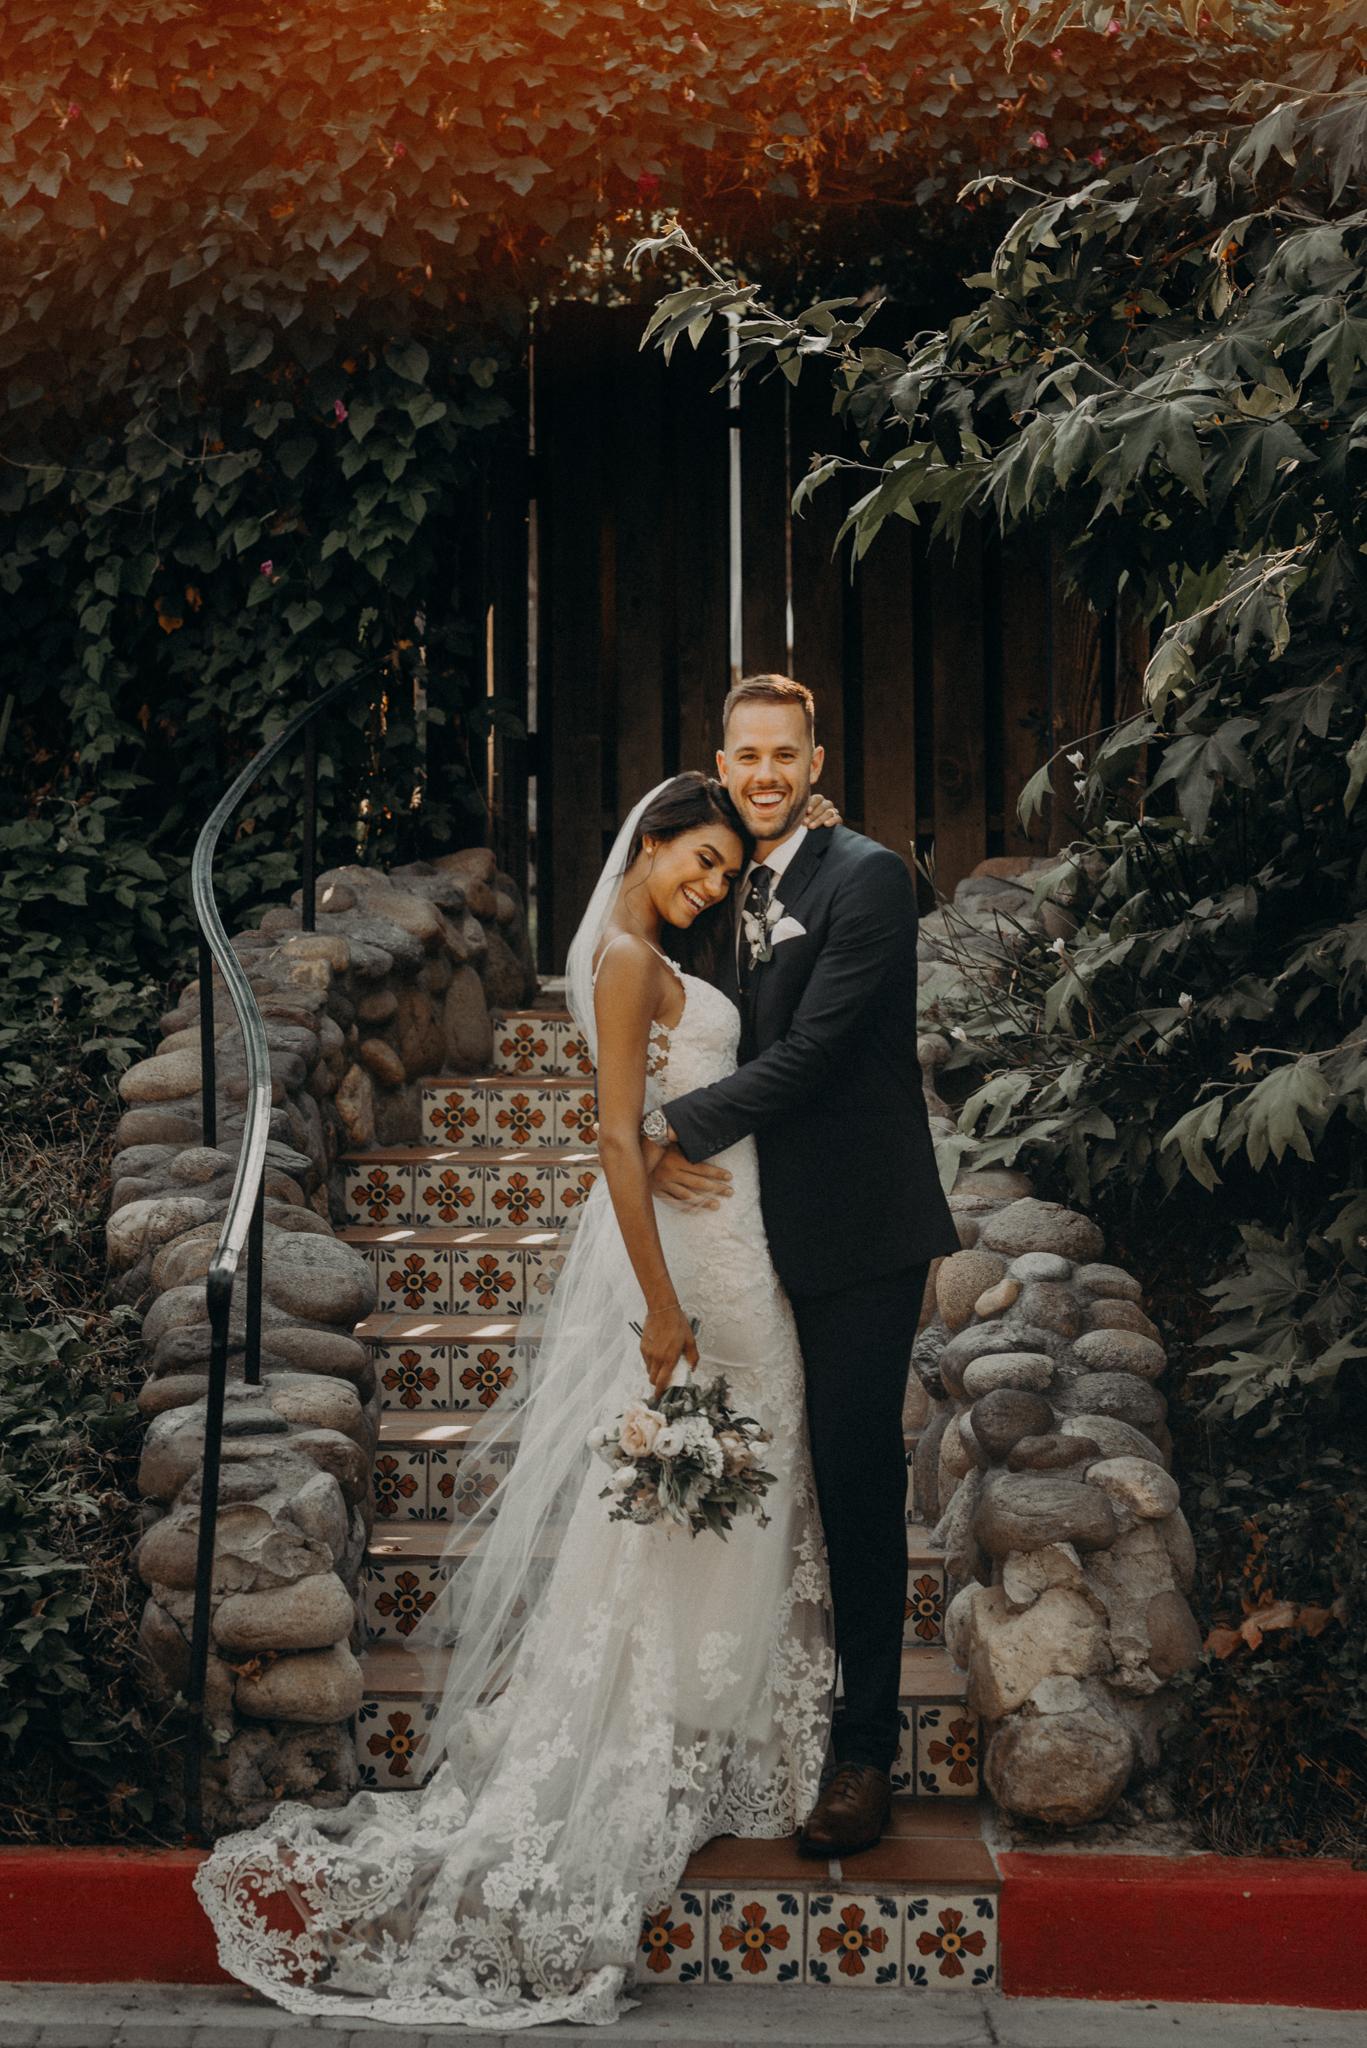 Isaiah + Taylor Photography - Rancho Las Lomas Wedding, Los Angeles Wedding Photographer-117.jpg